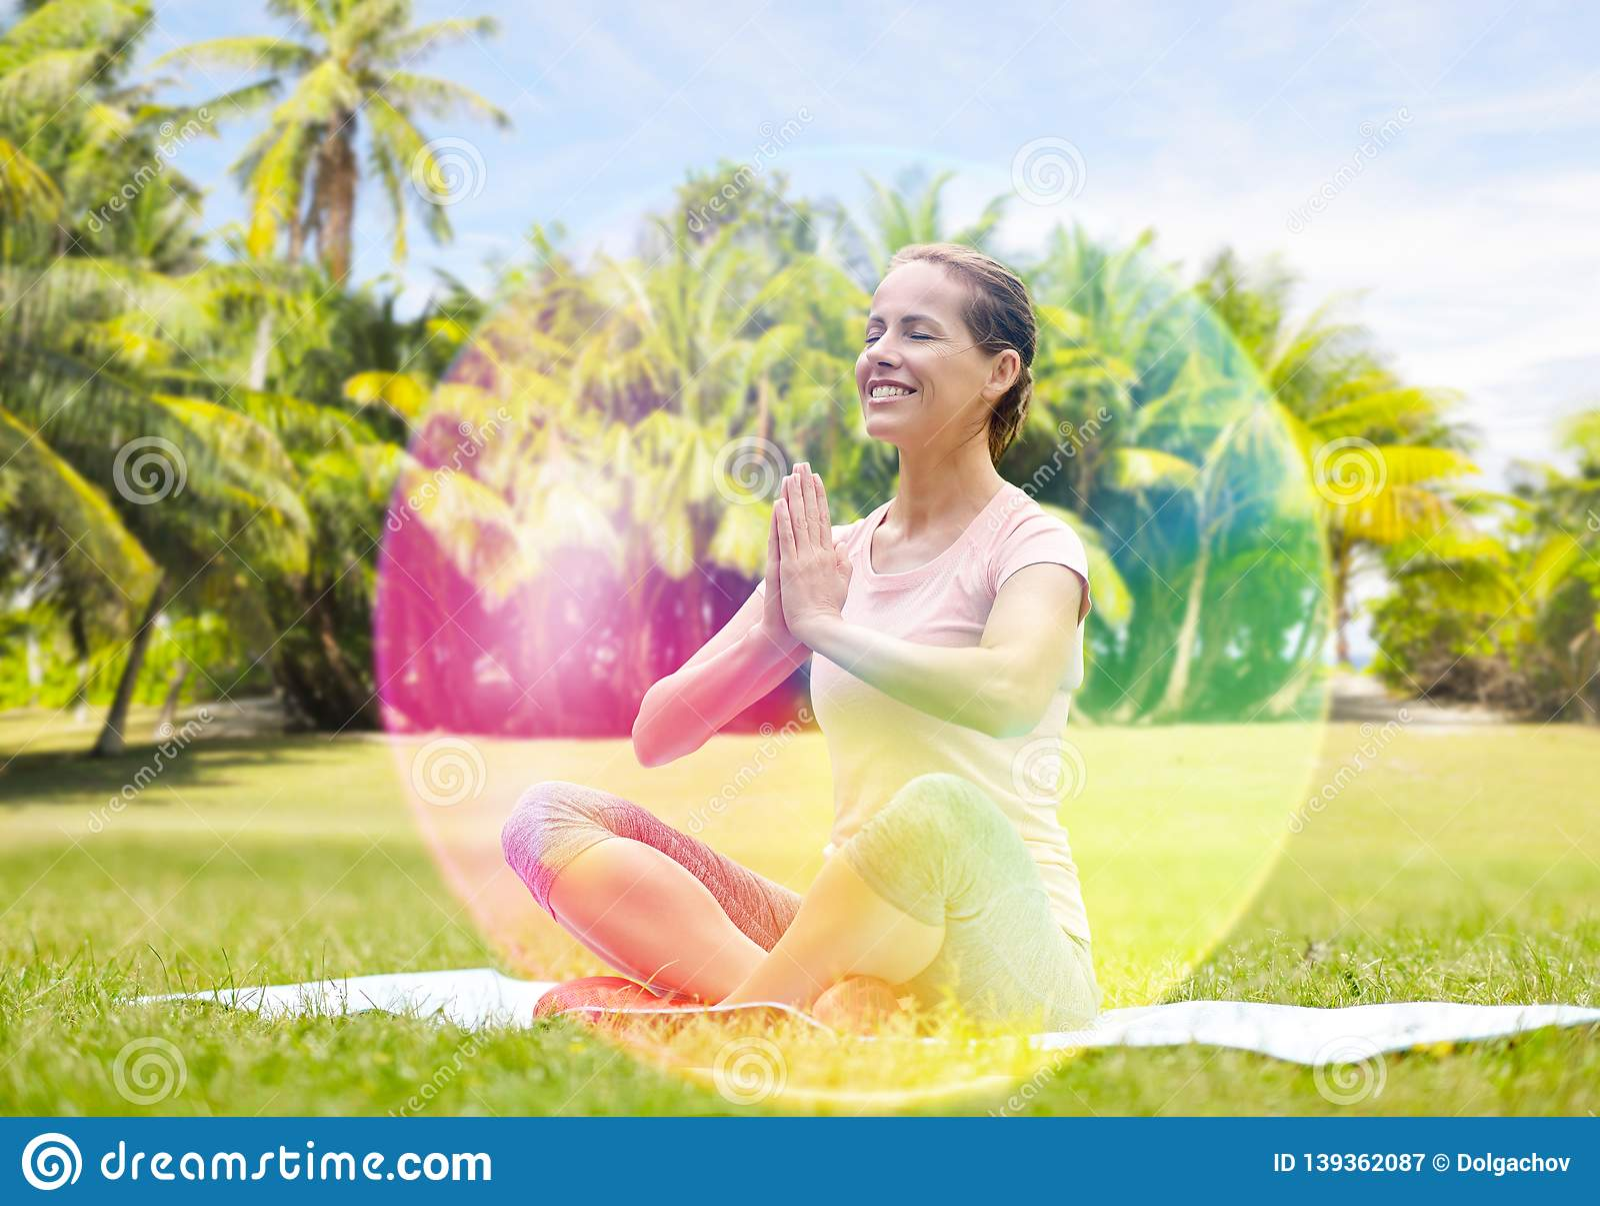 Happy woman meditating in summer park over aura